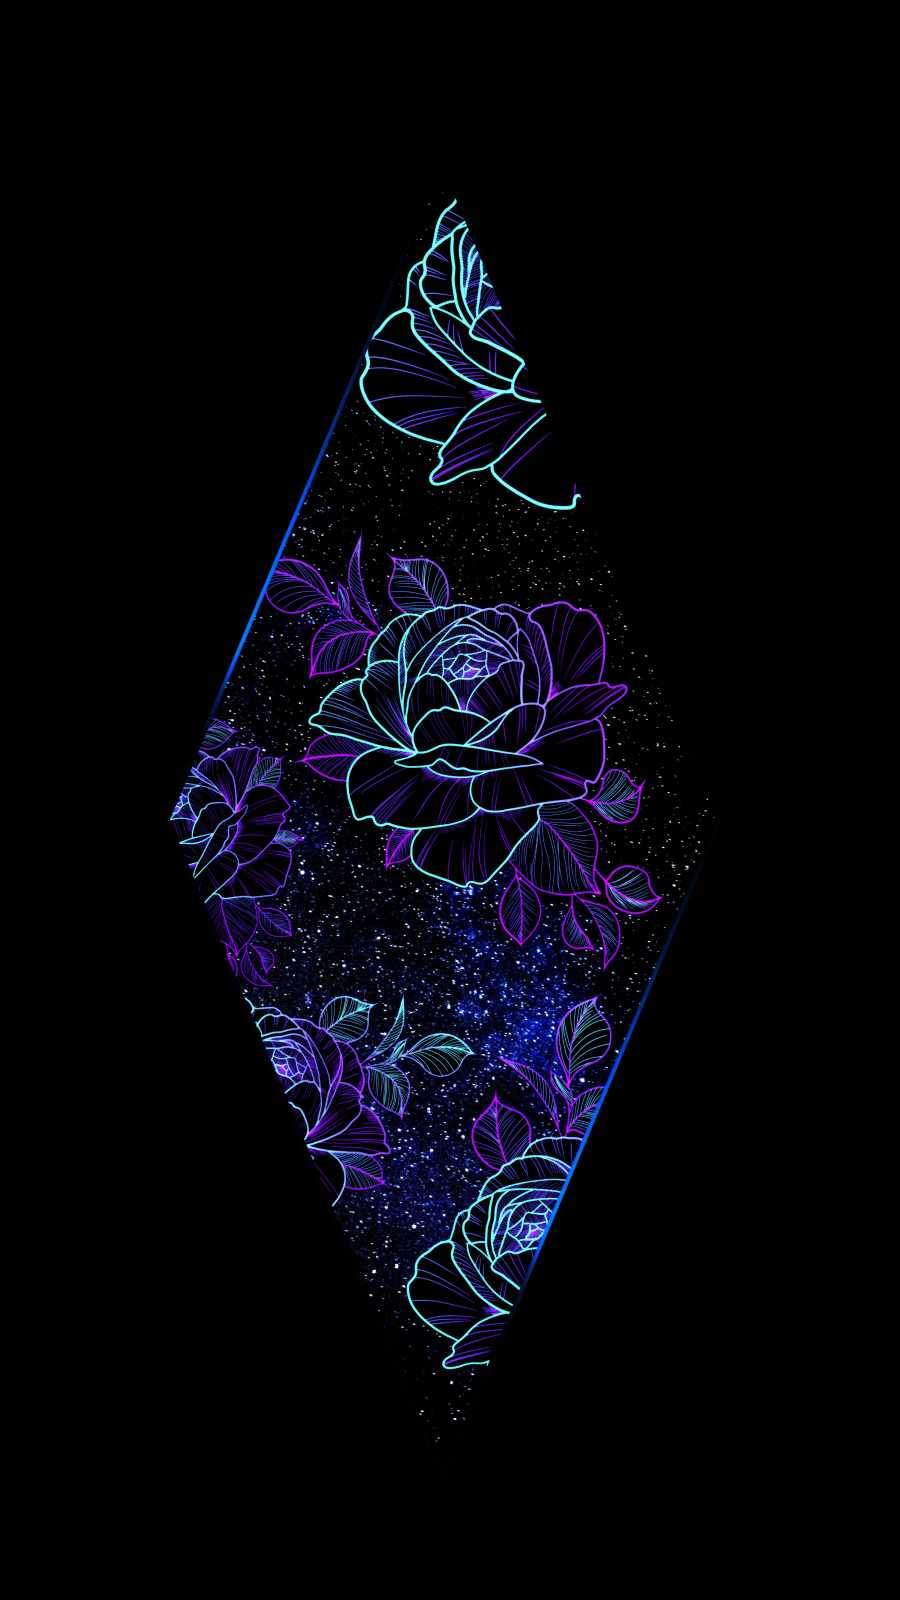 Rhombus Space Flowers Amoled